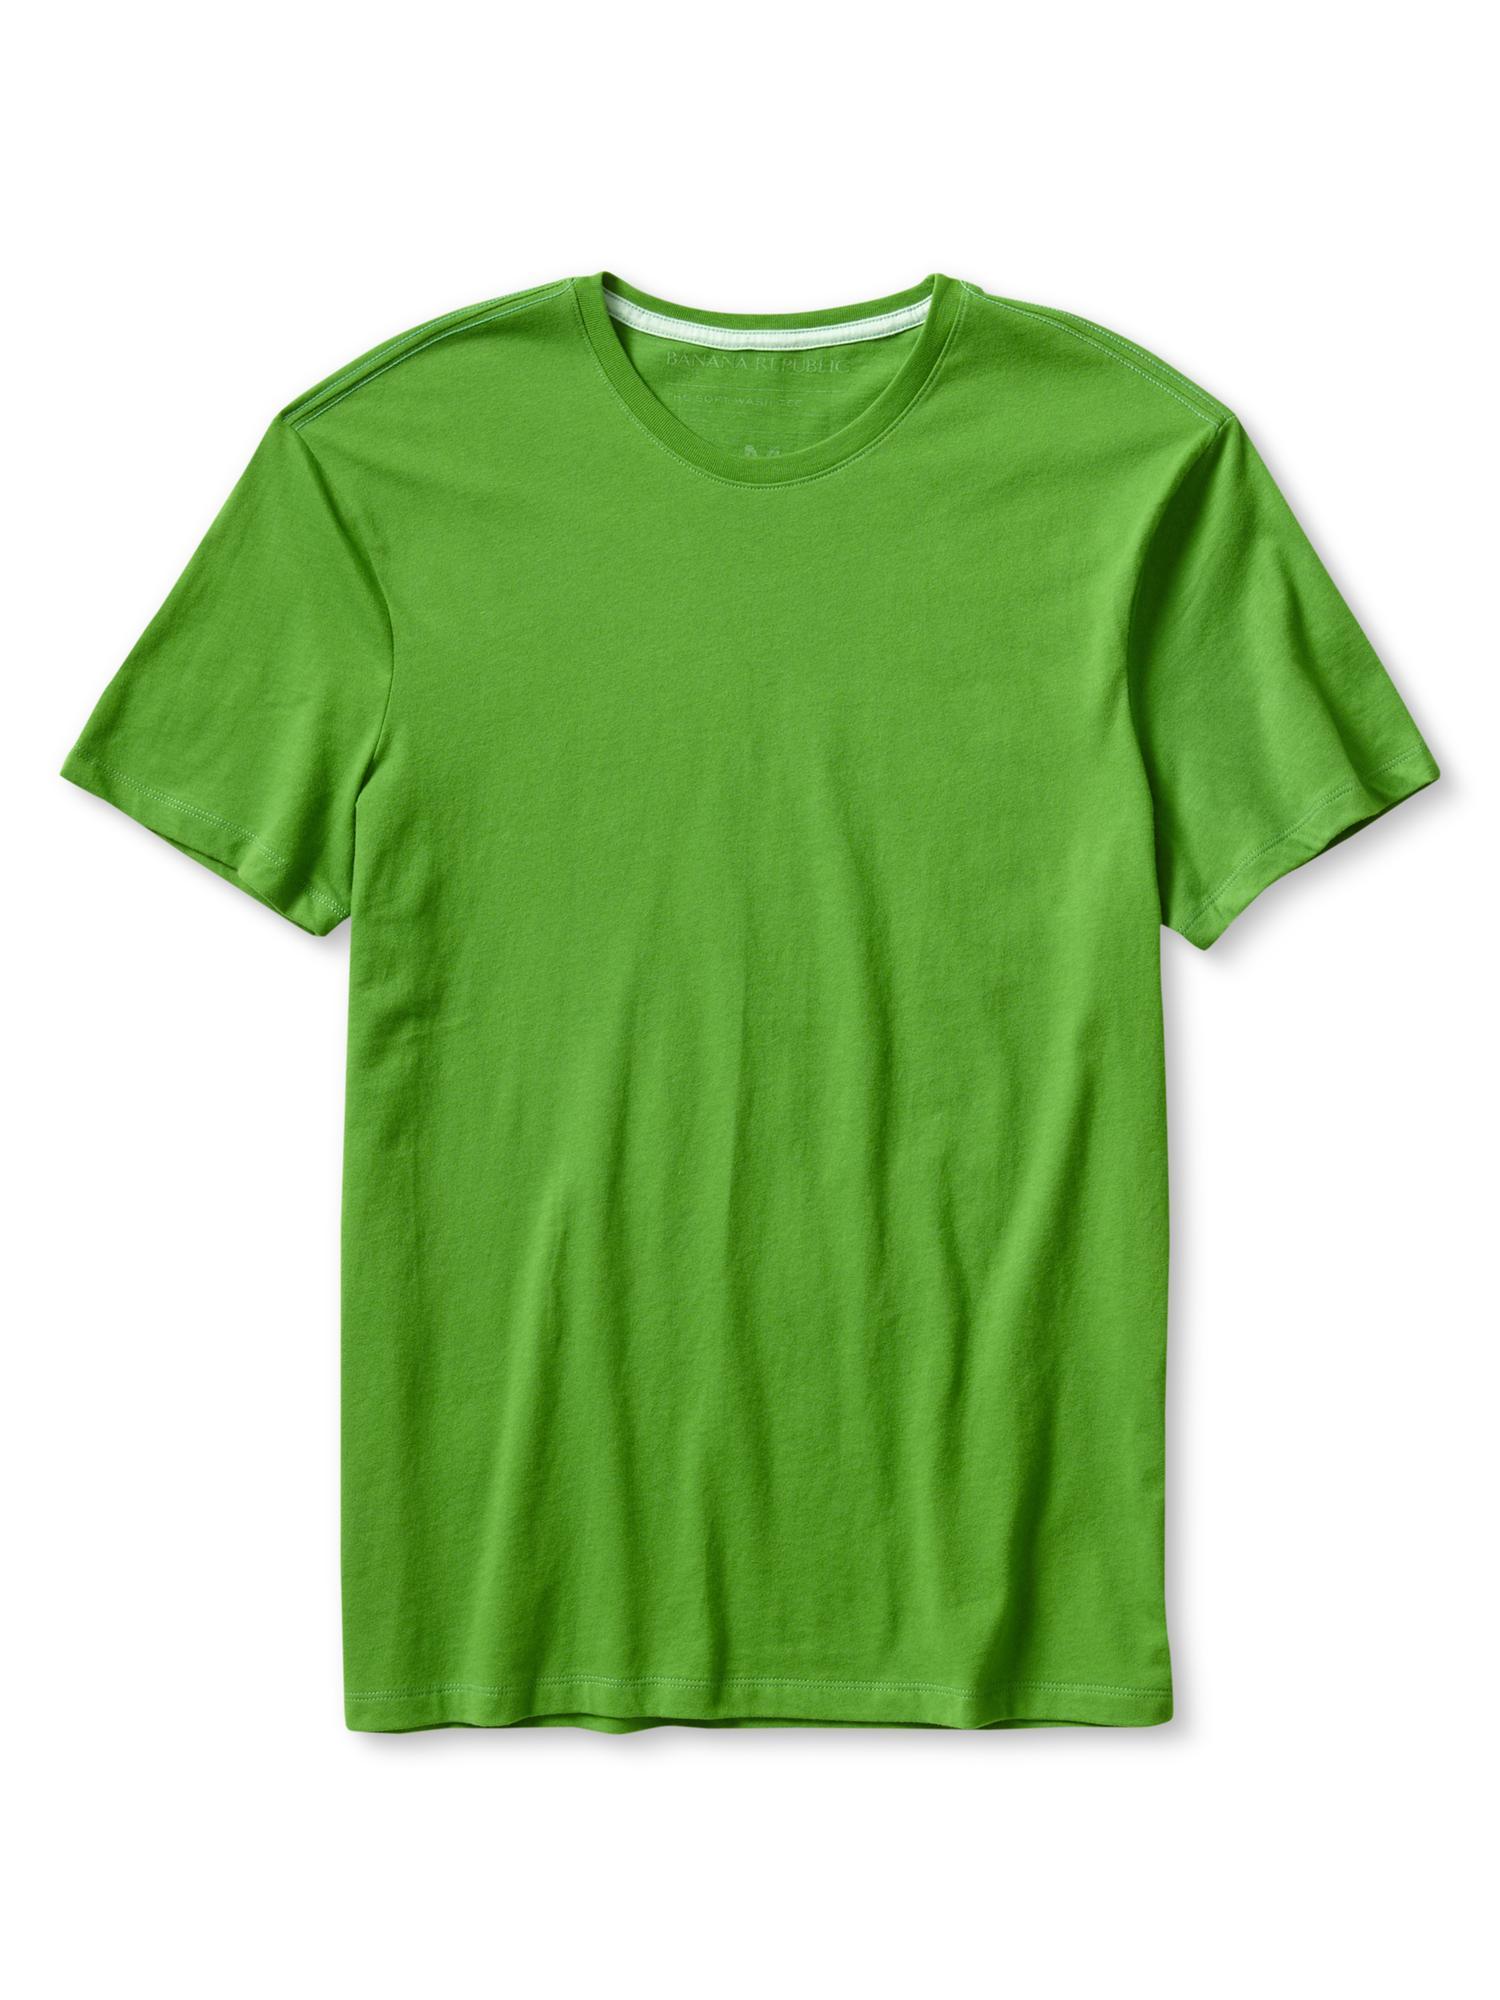 Banana republic soft wash cotton t shirt in green for men for Soft cotton dress shirts